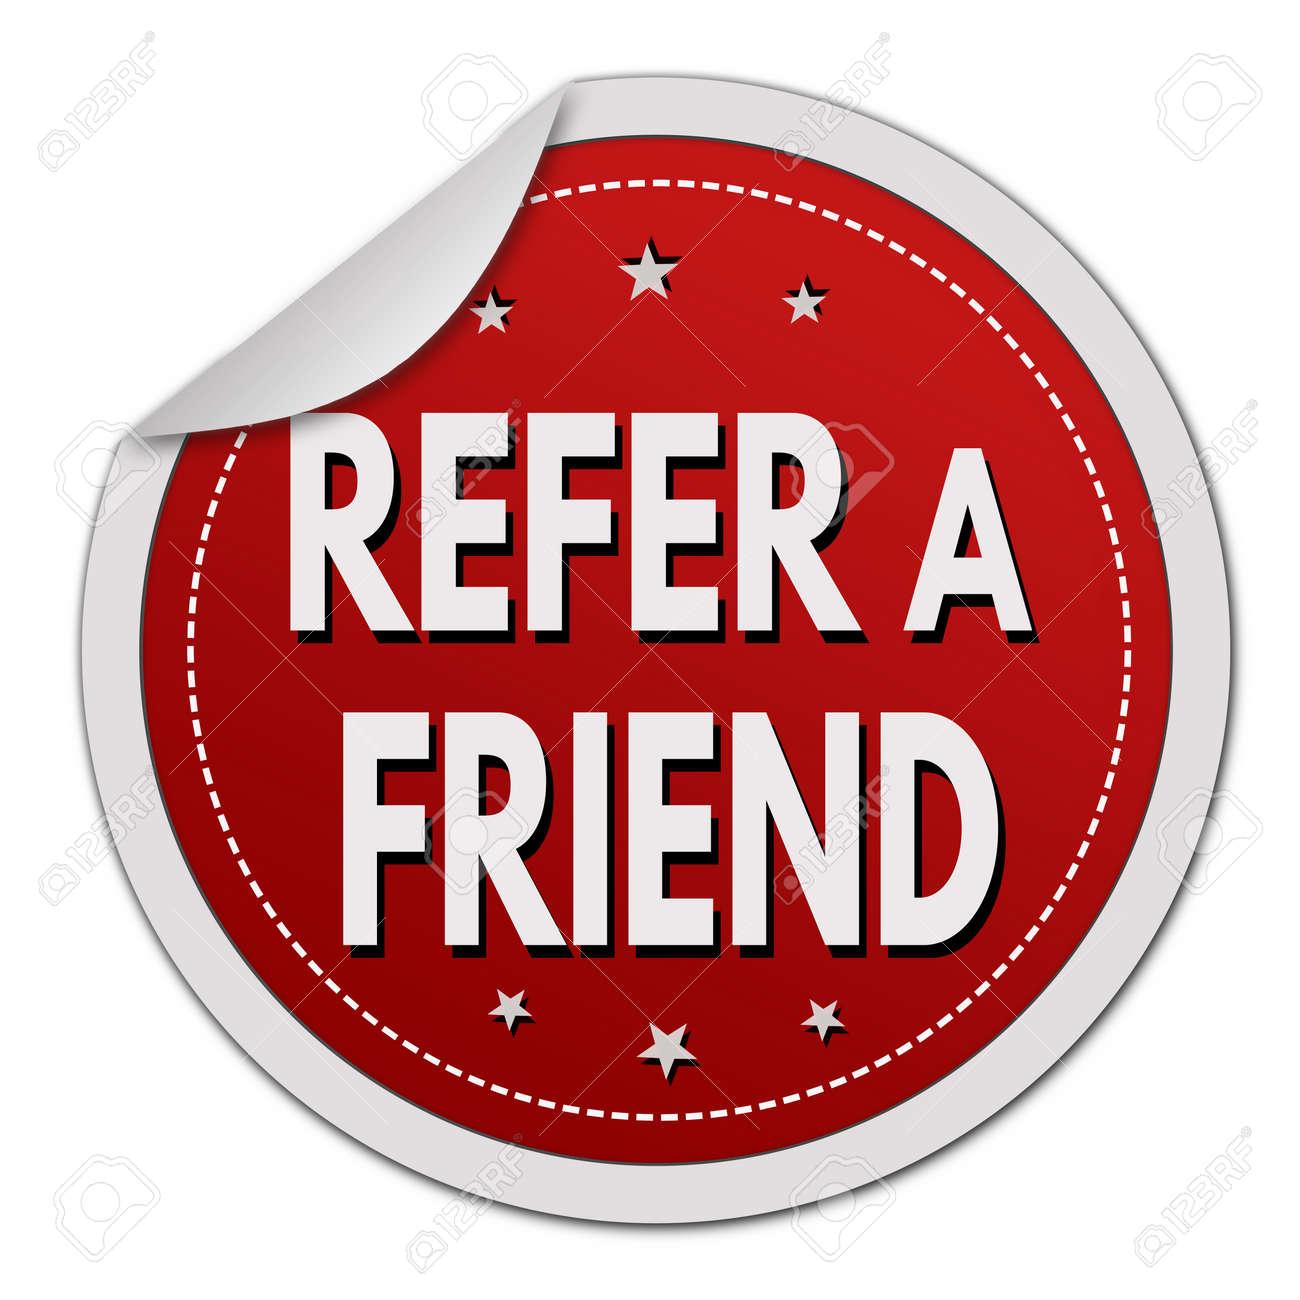 Refer a friend sticker on white background, vector illustration - 66147881